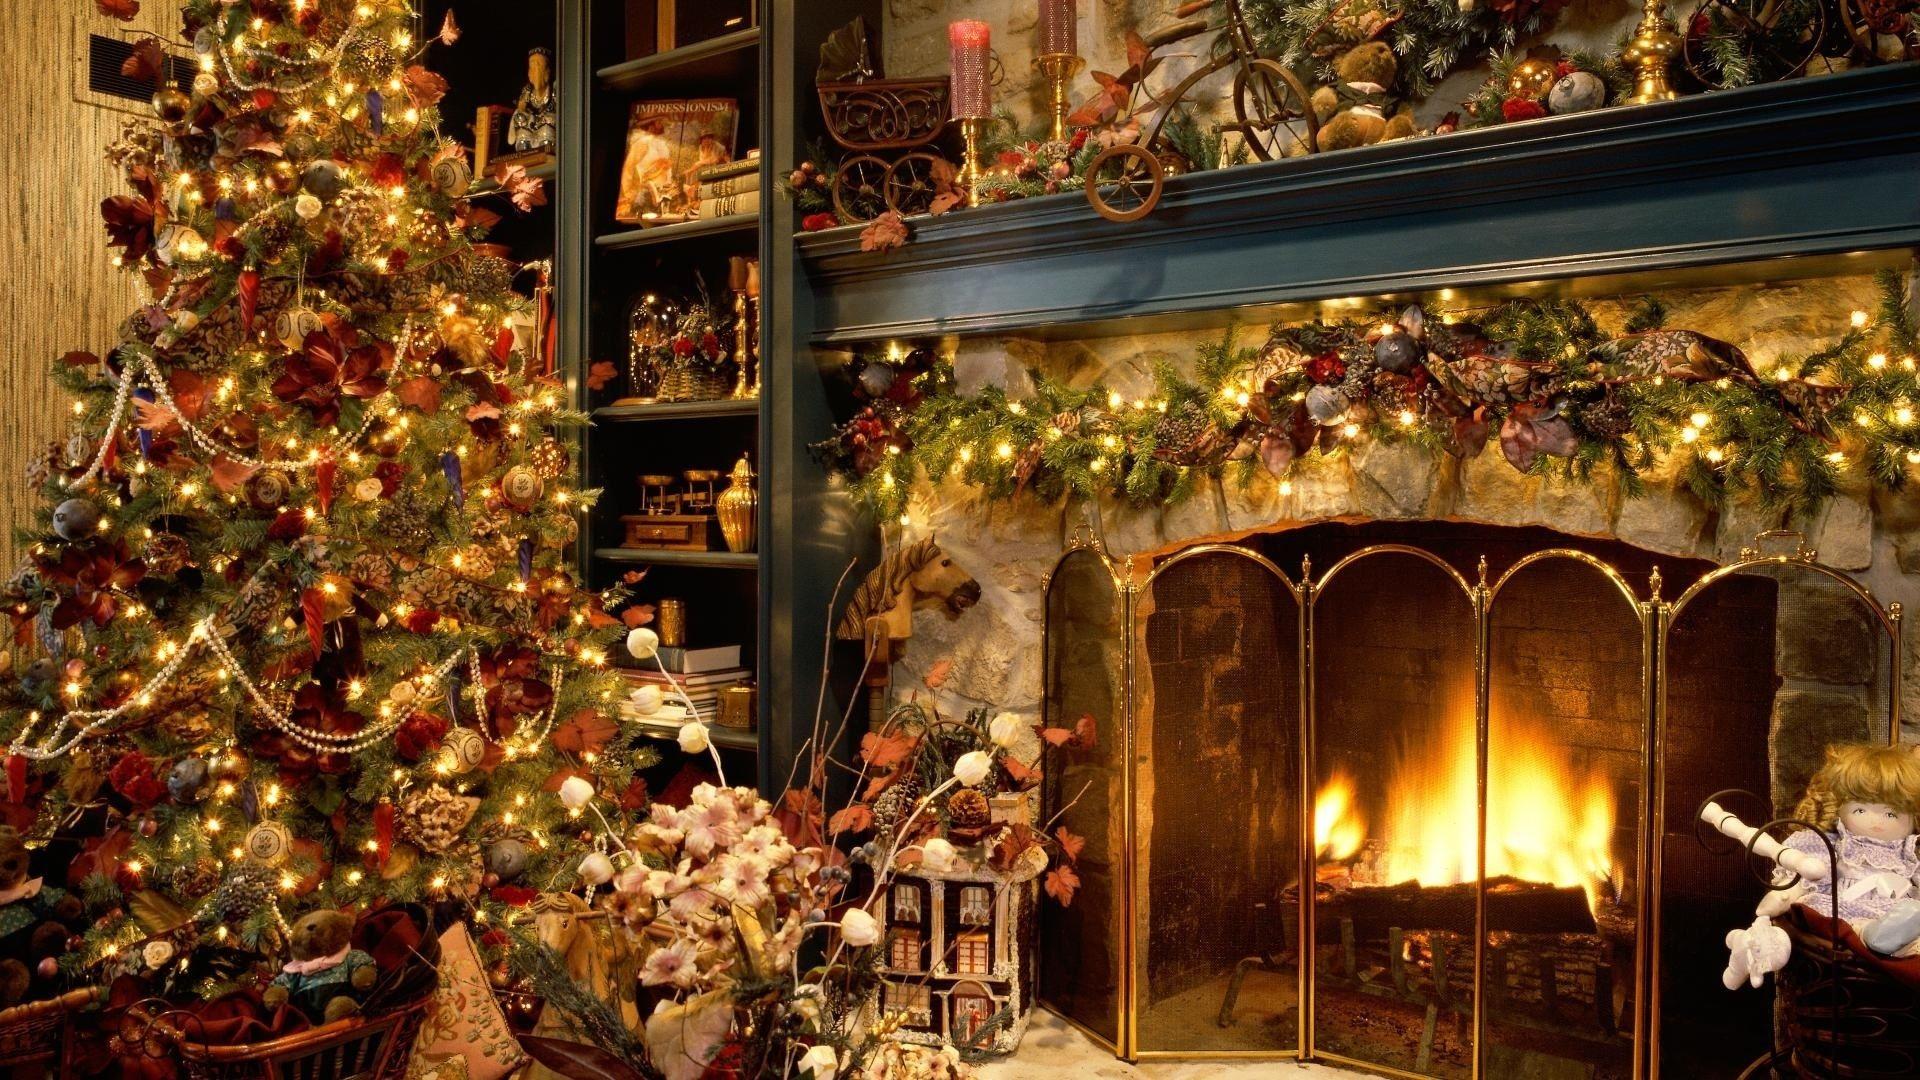 Christmas Fireplace Comfort beautiful wallpaper